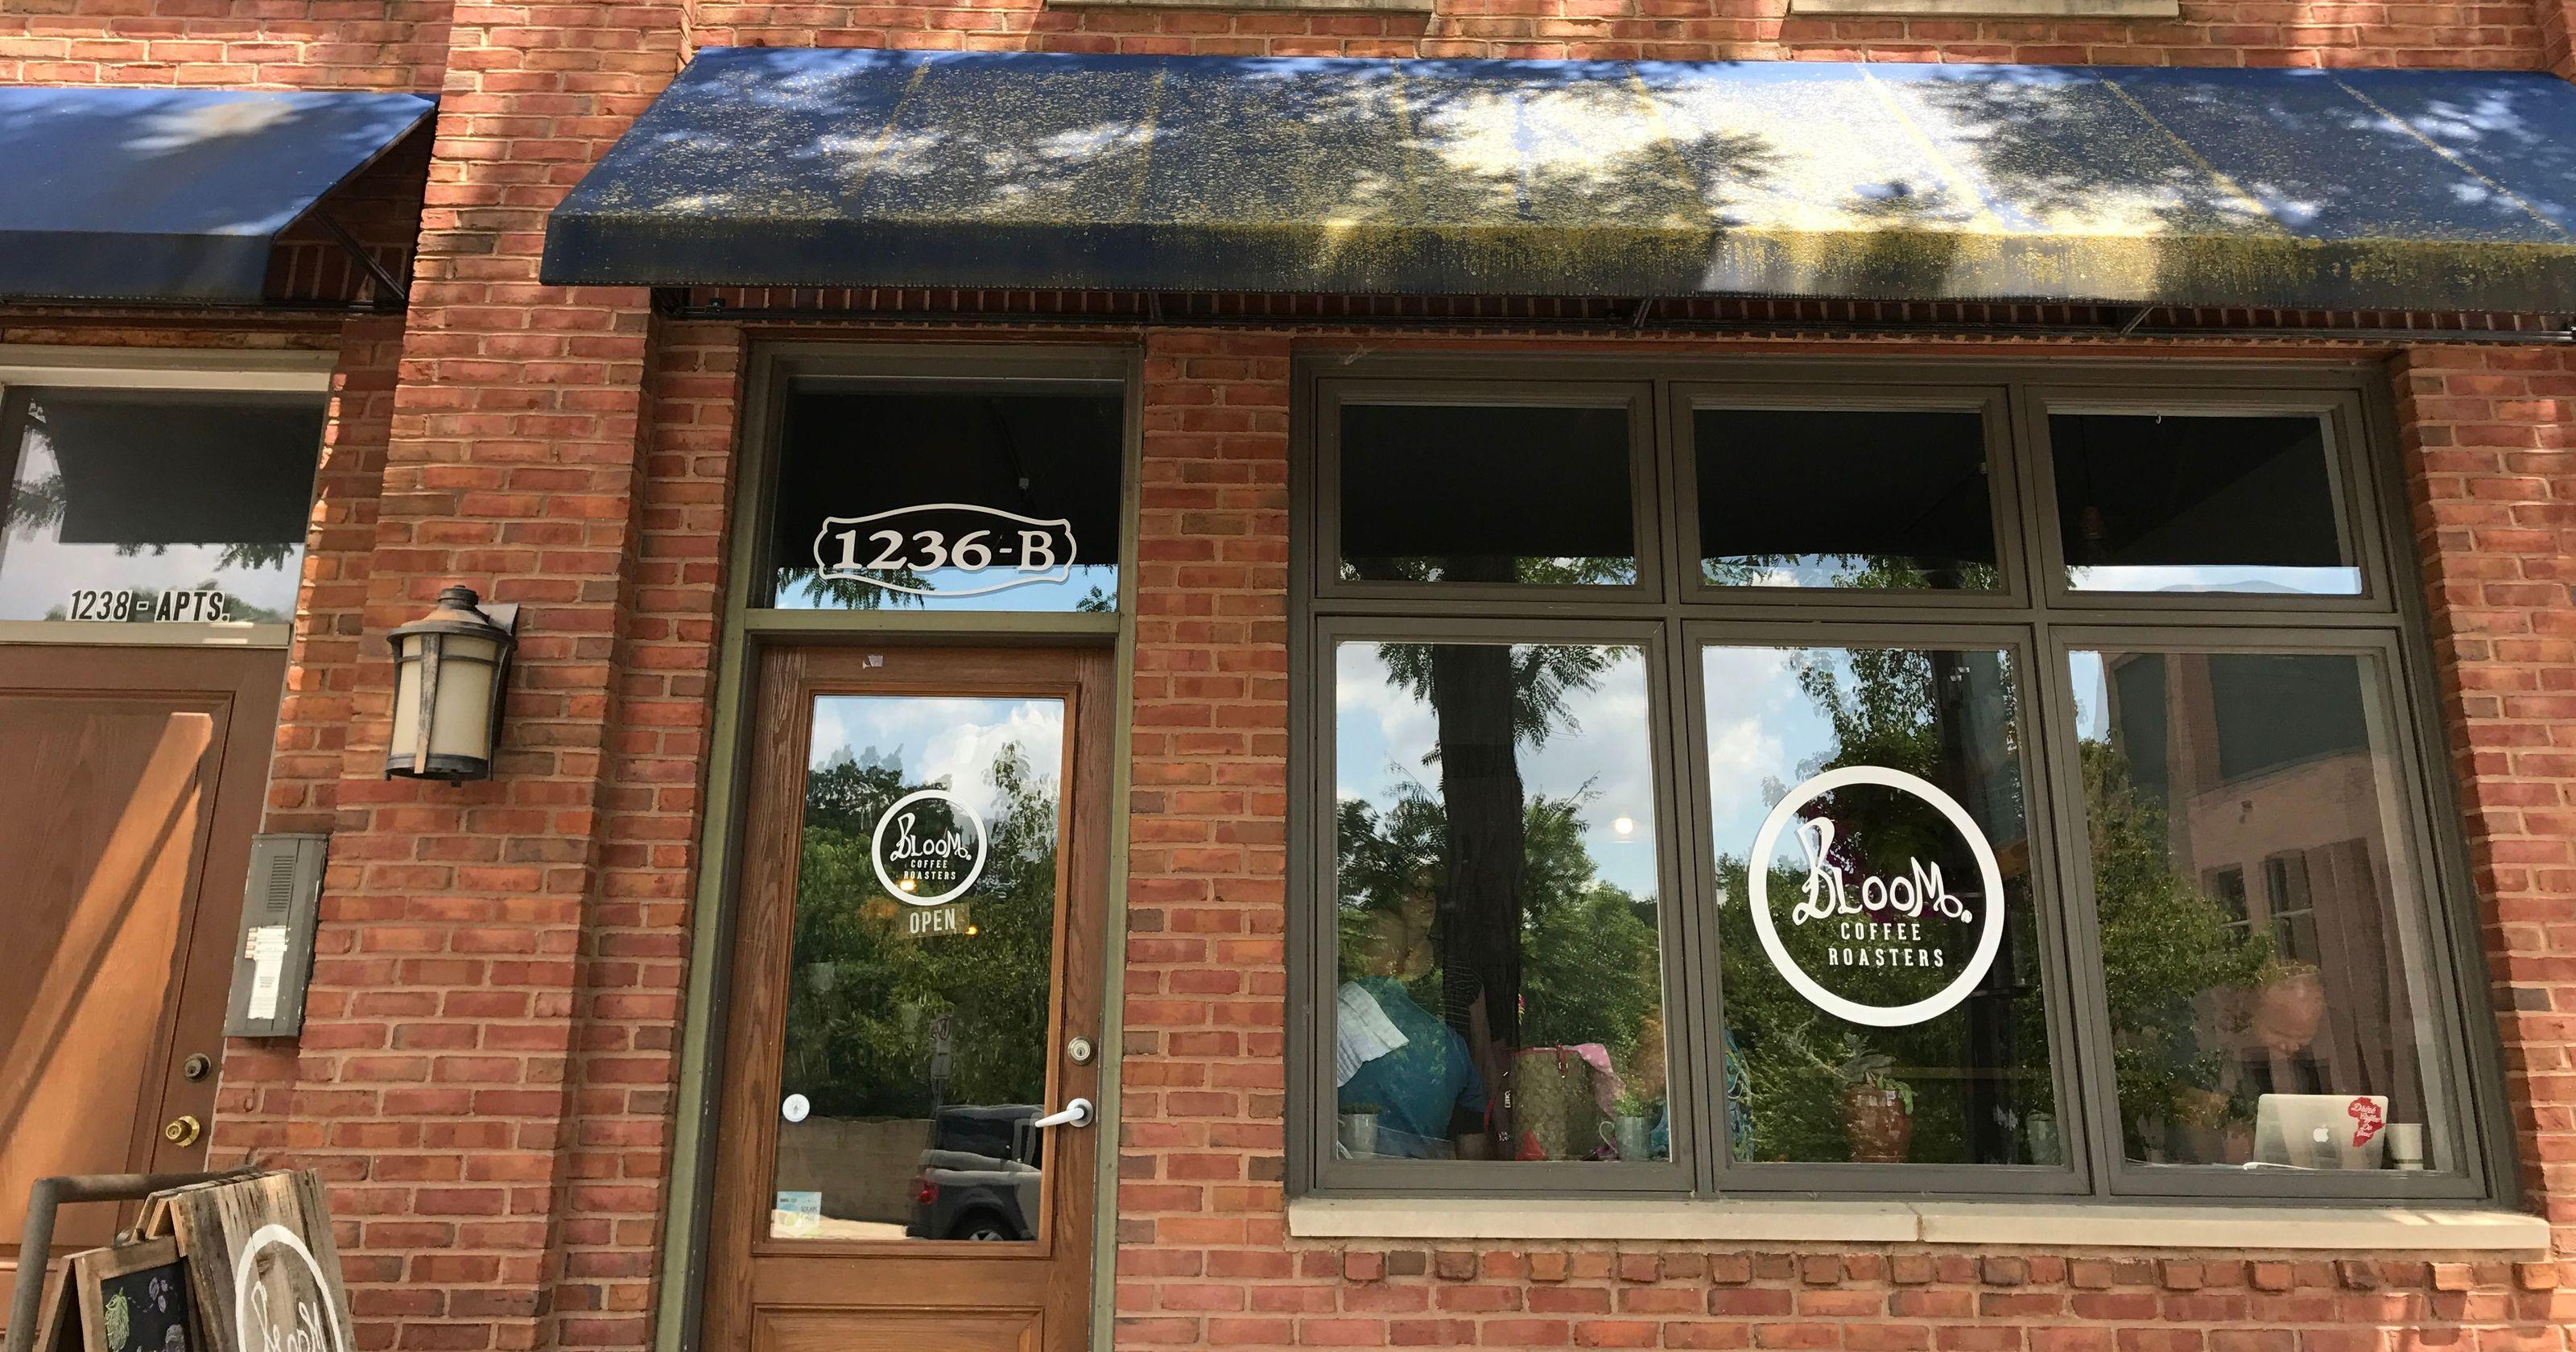 Bloom coffee roasters wont reopen cafe roasting space in